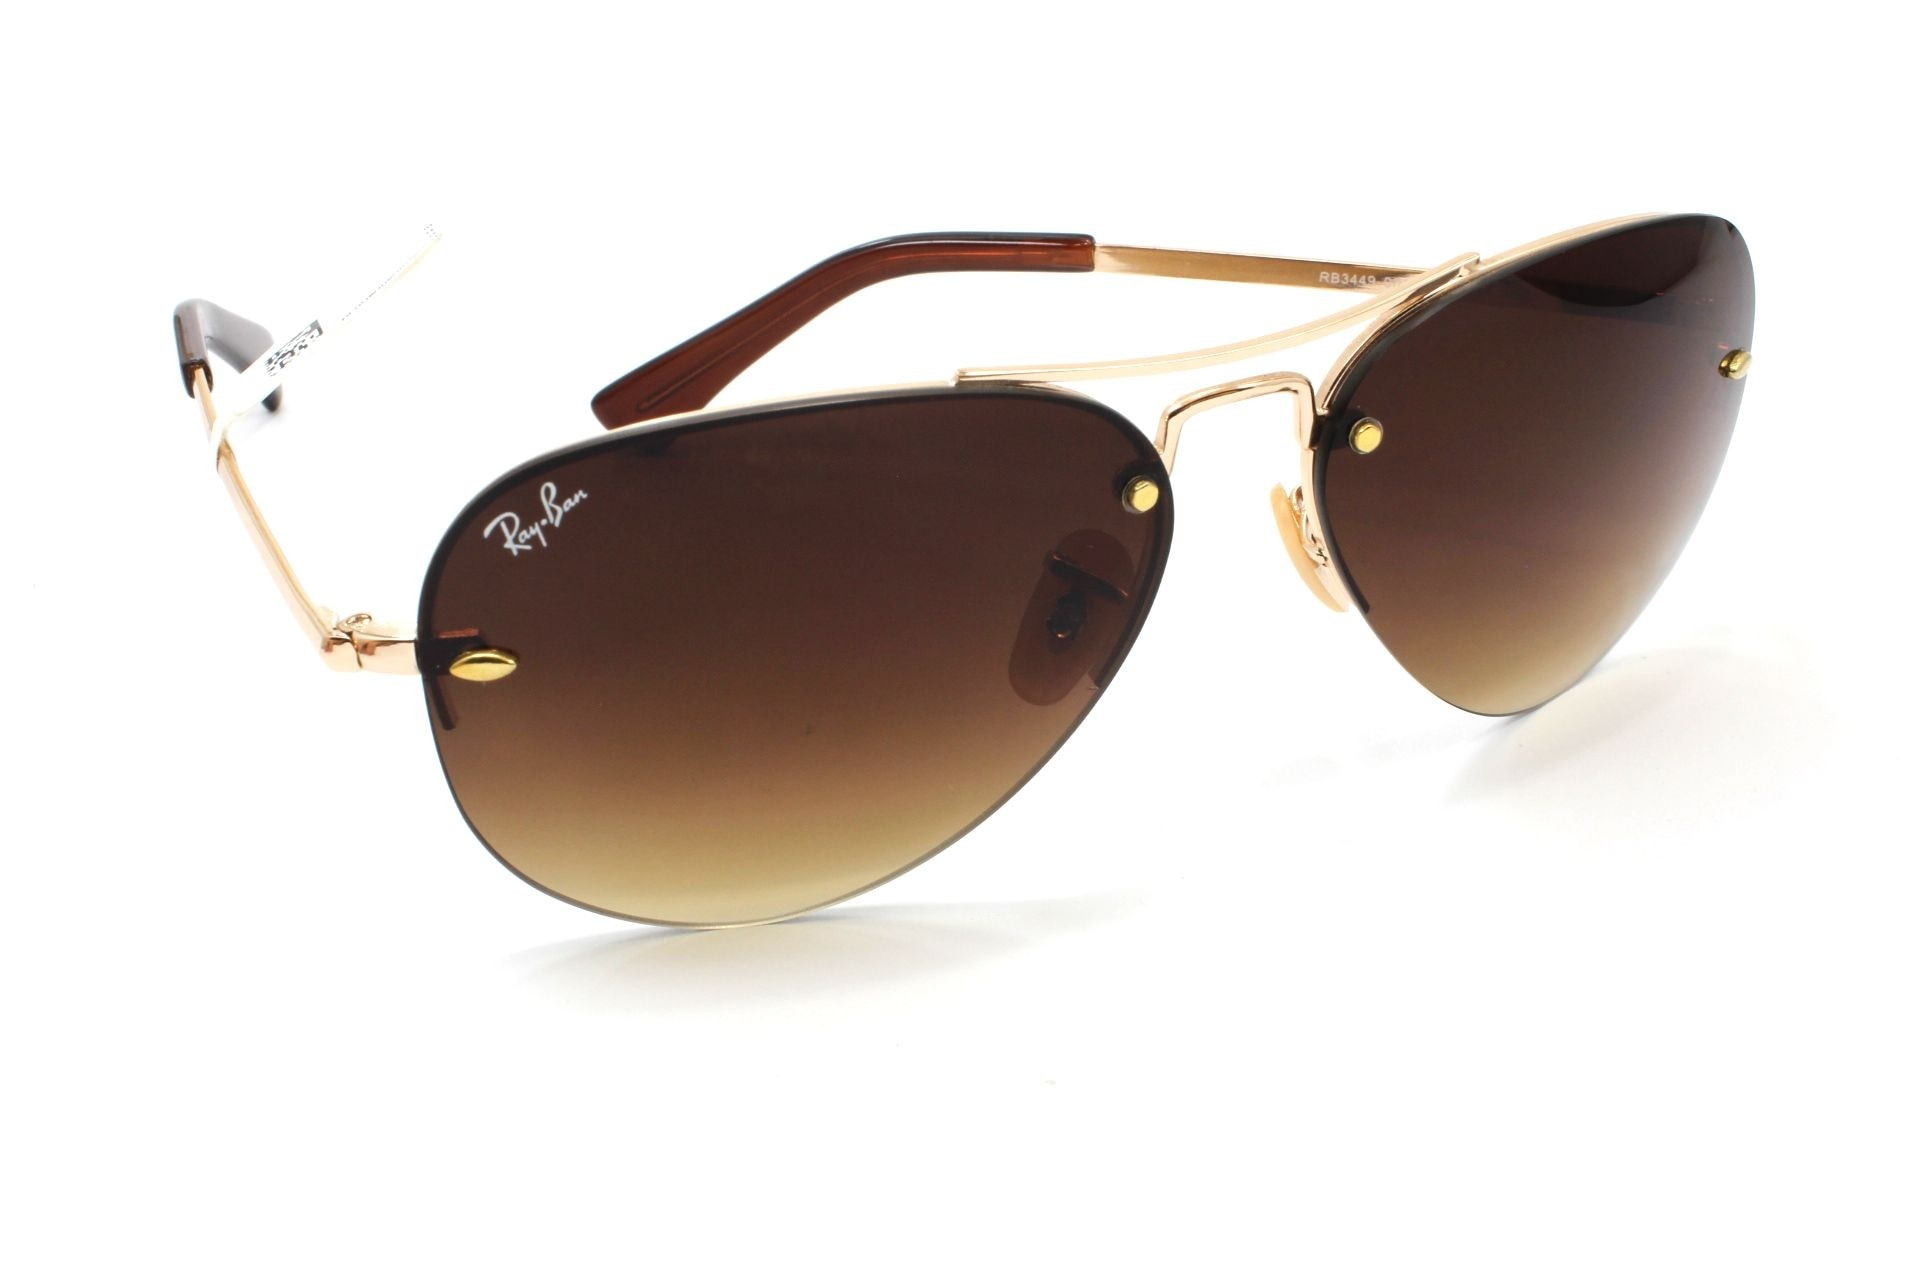 3449 001/13 59 RAYBAN Sunglasses Quality and Original Sun Glasses